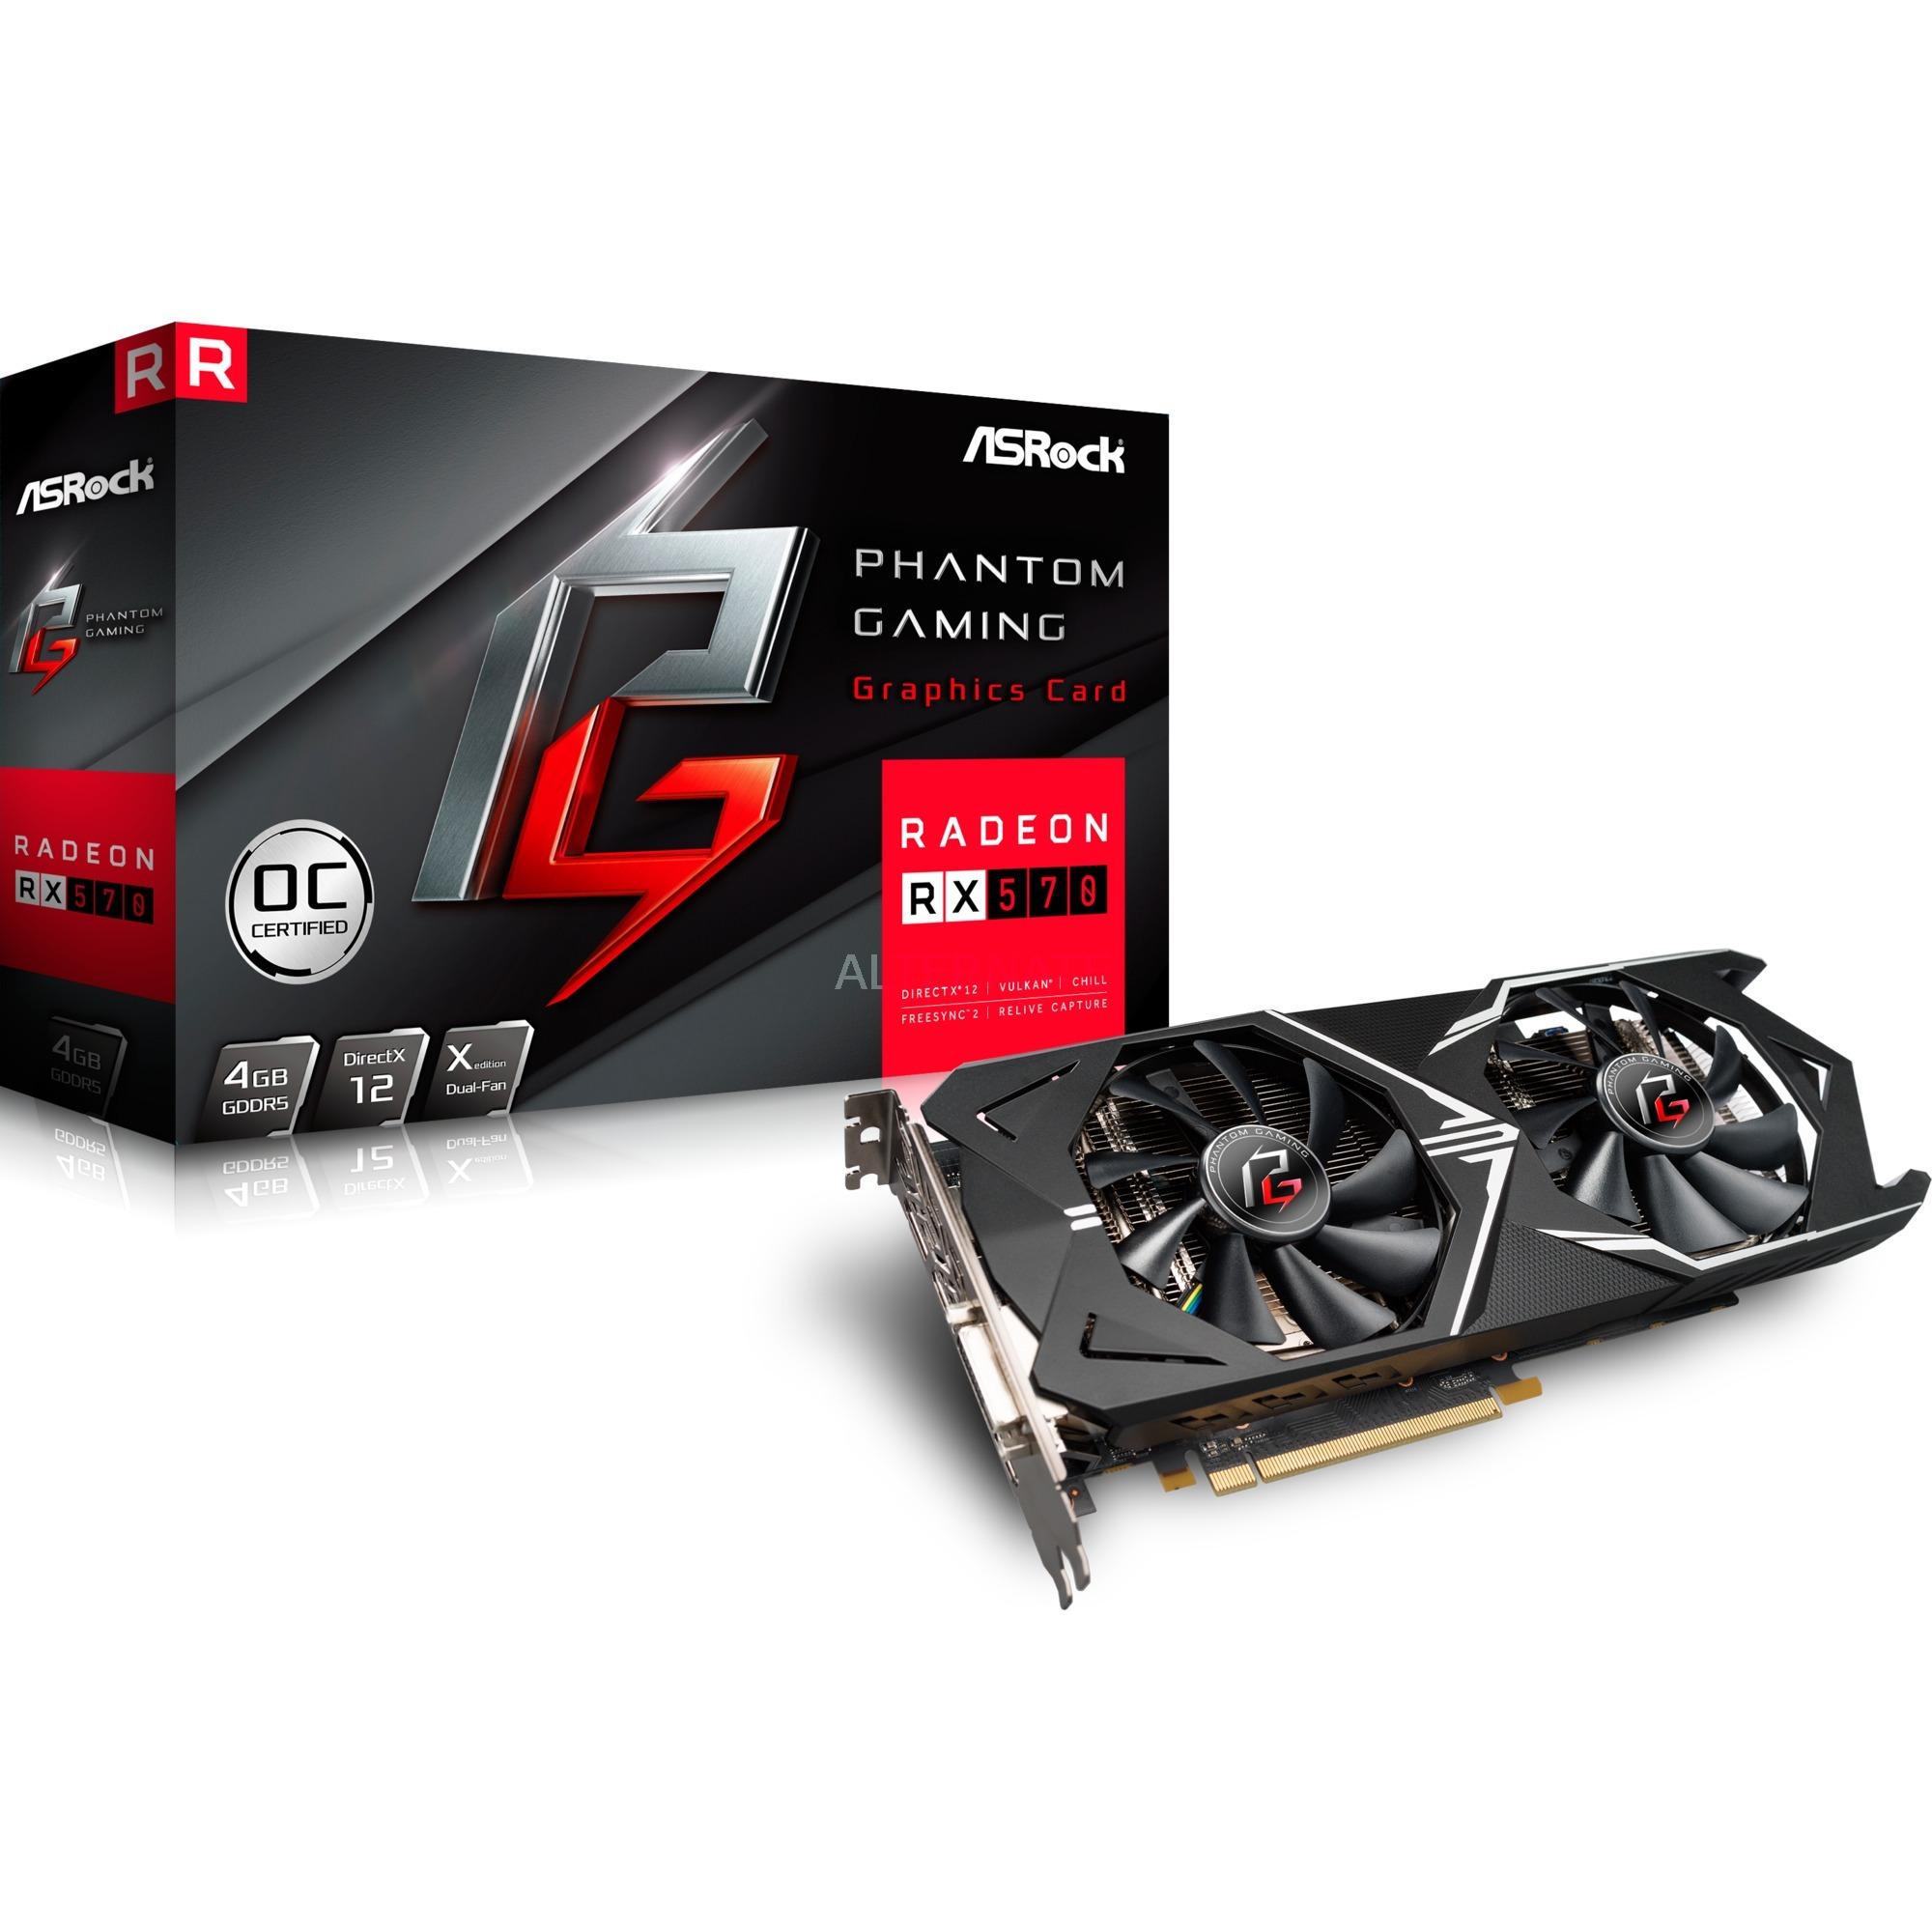 90-GA0800-00UANF tarjeta gráfica Radeon RX 570 4 GB GDDR5